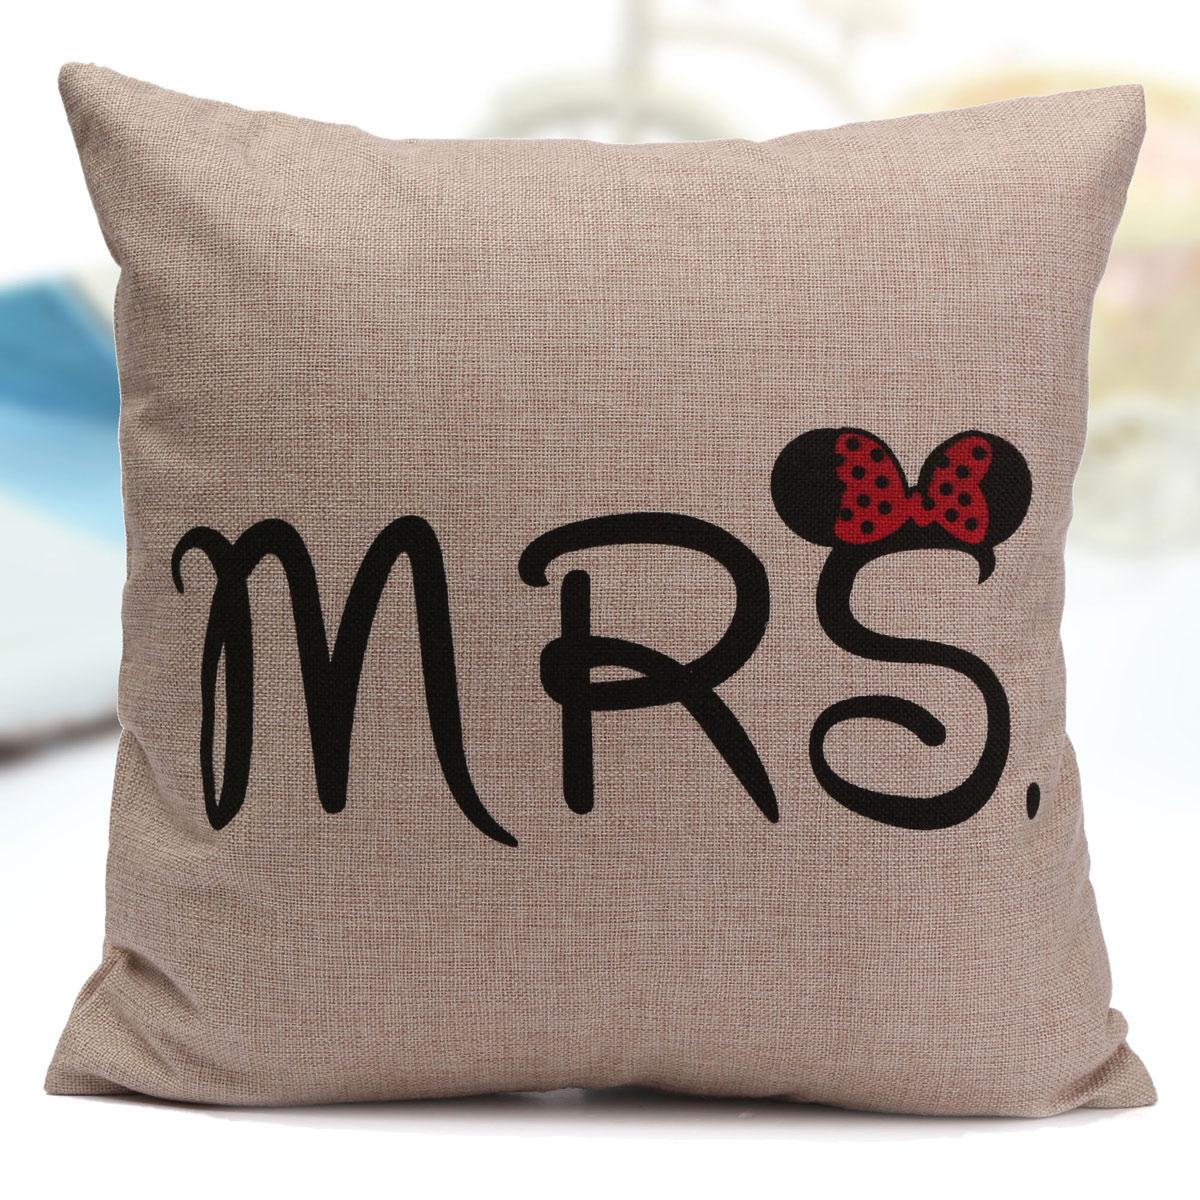 Modern Family Pillow Case : Cartoon Mr Mrs Cotton Linen Pillow Case Sofa Back Throw Cushion Cover Home Decor eBay